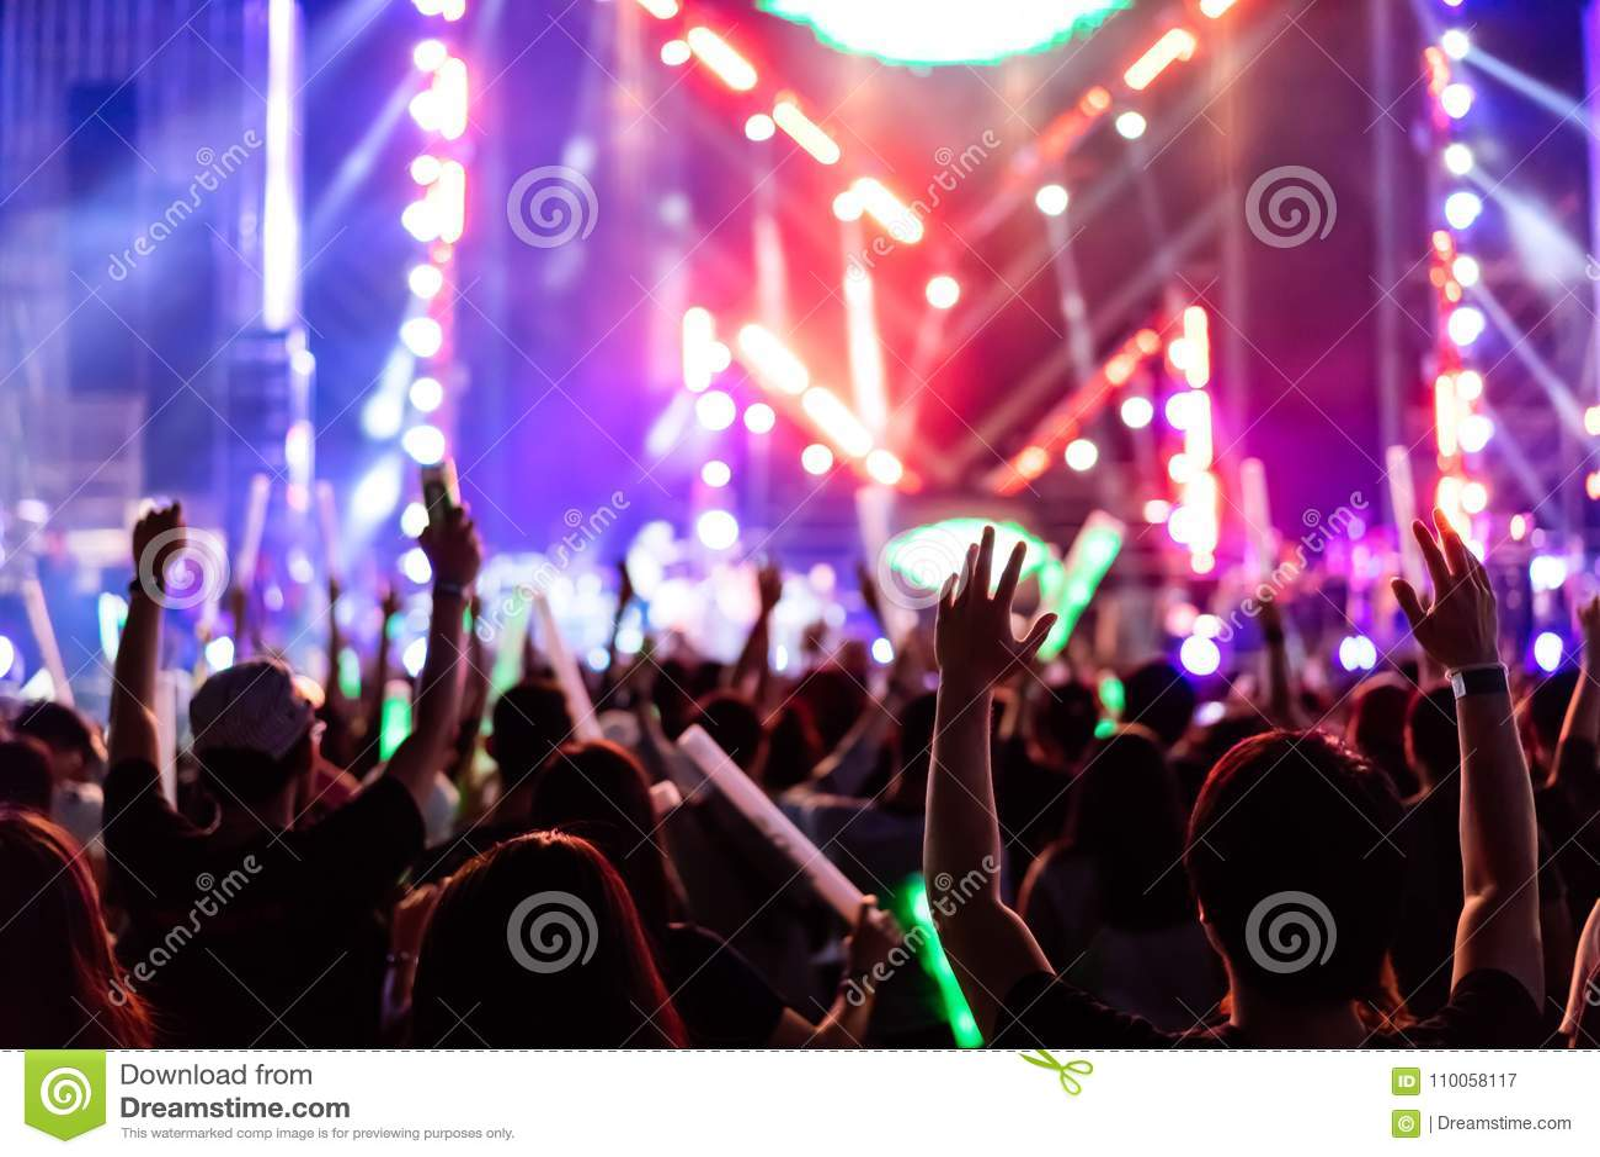 Crowd of hands up concert stage lights